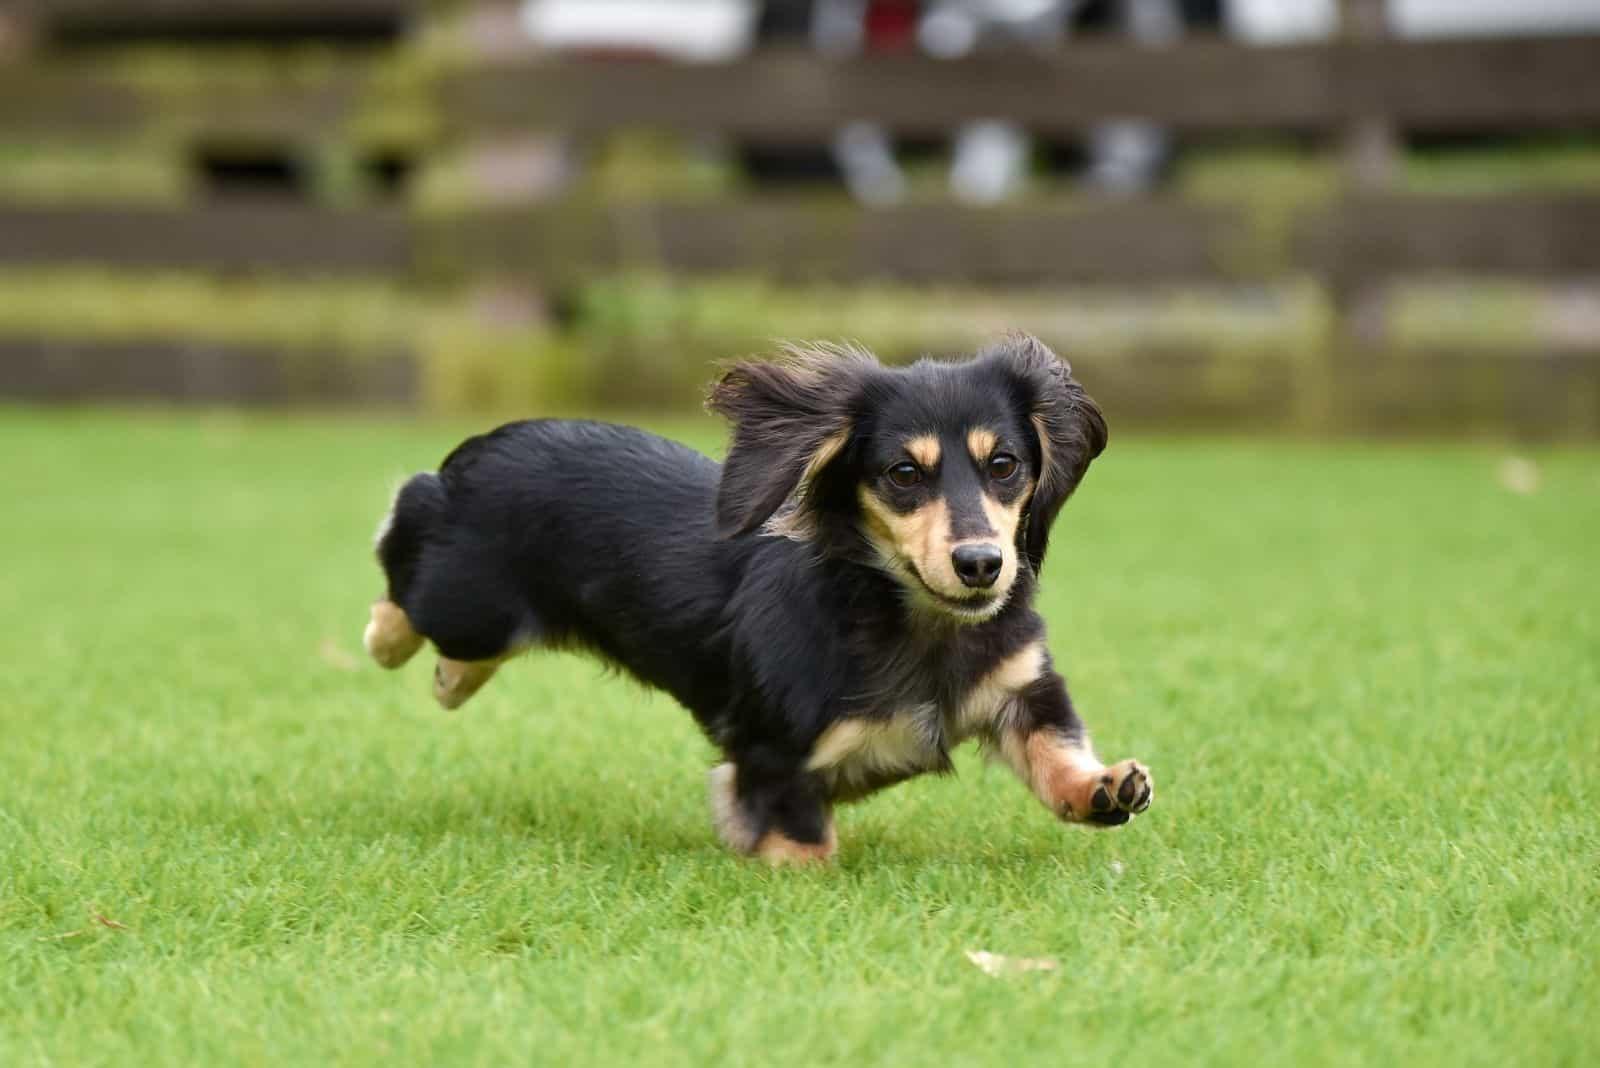 running dachshund dog running in the field